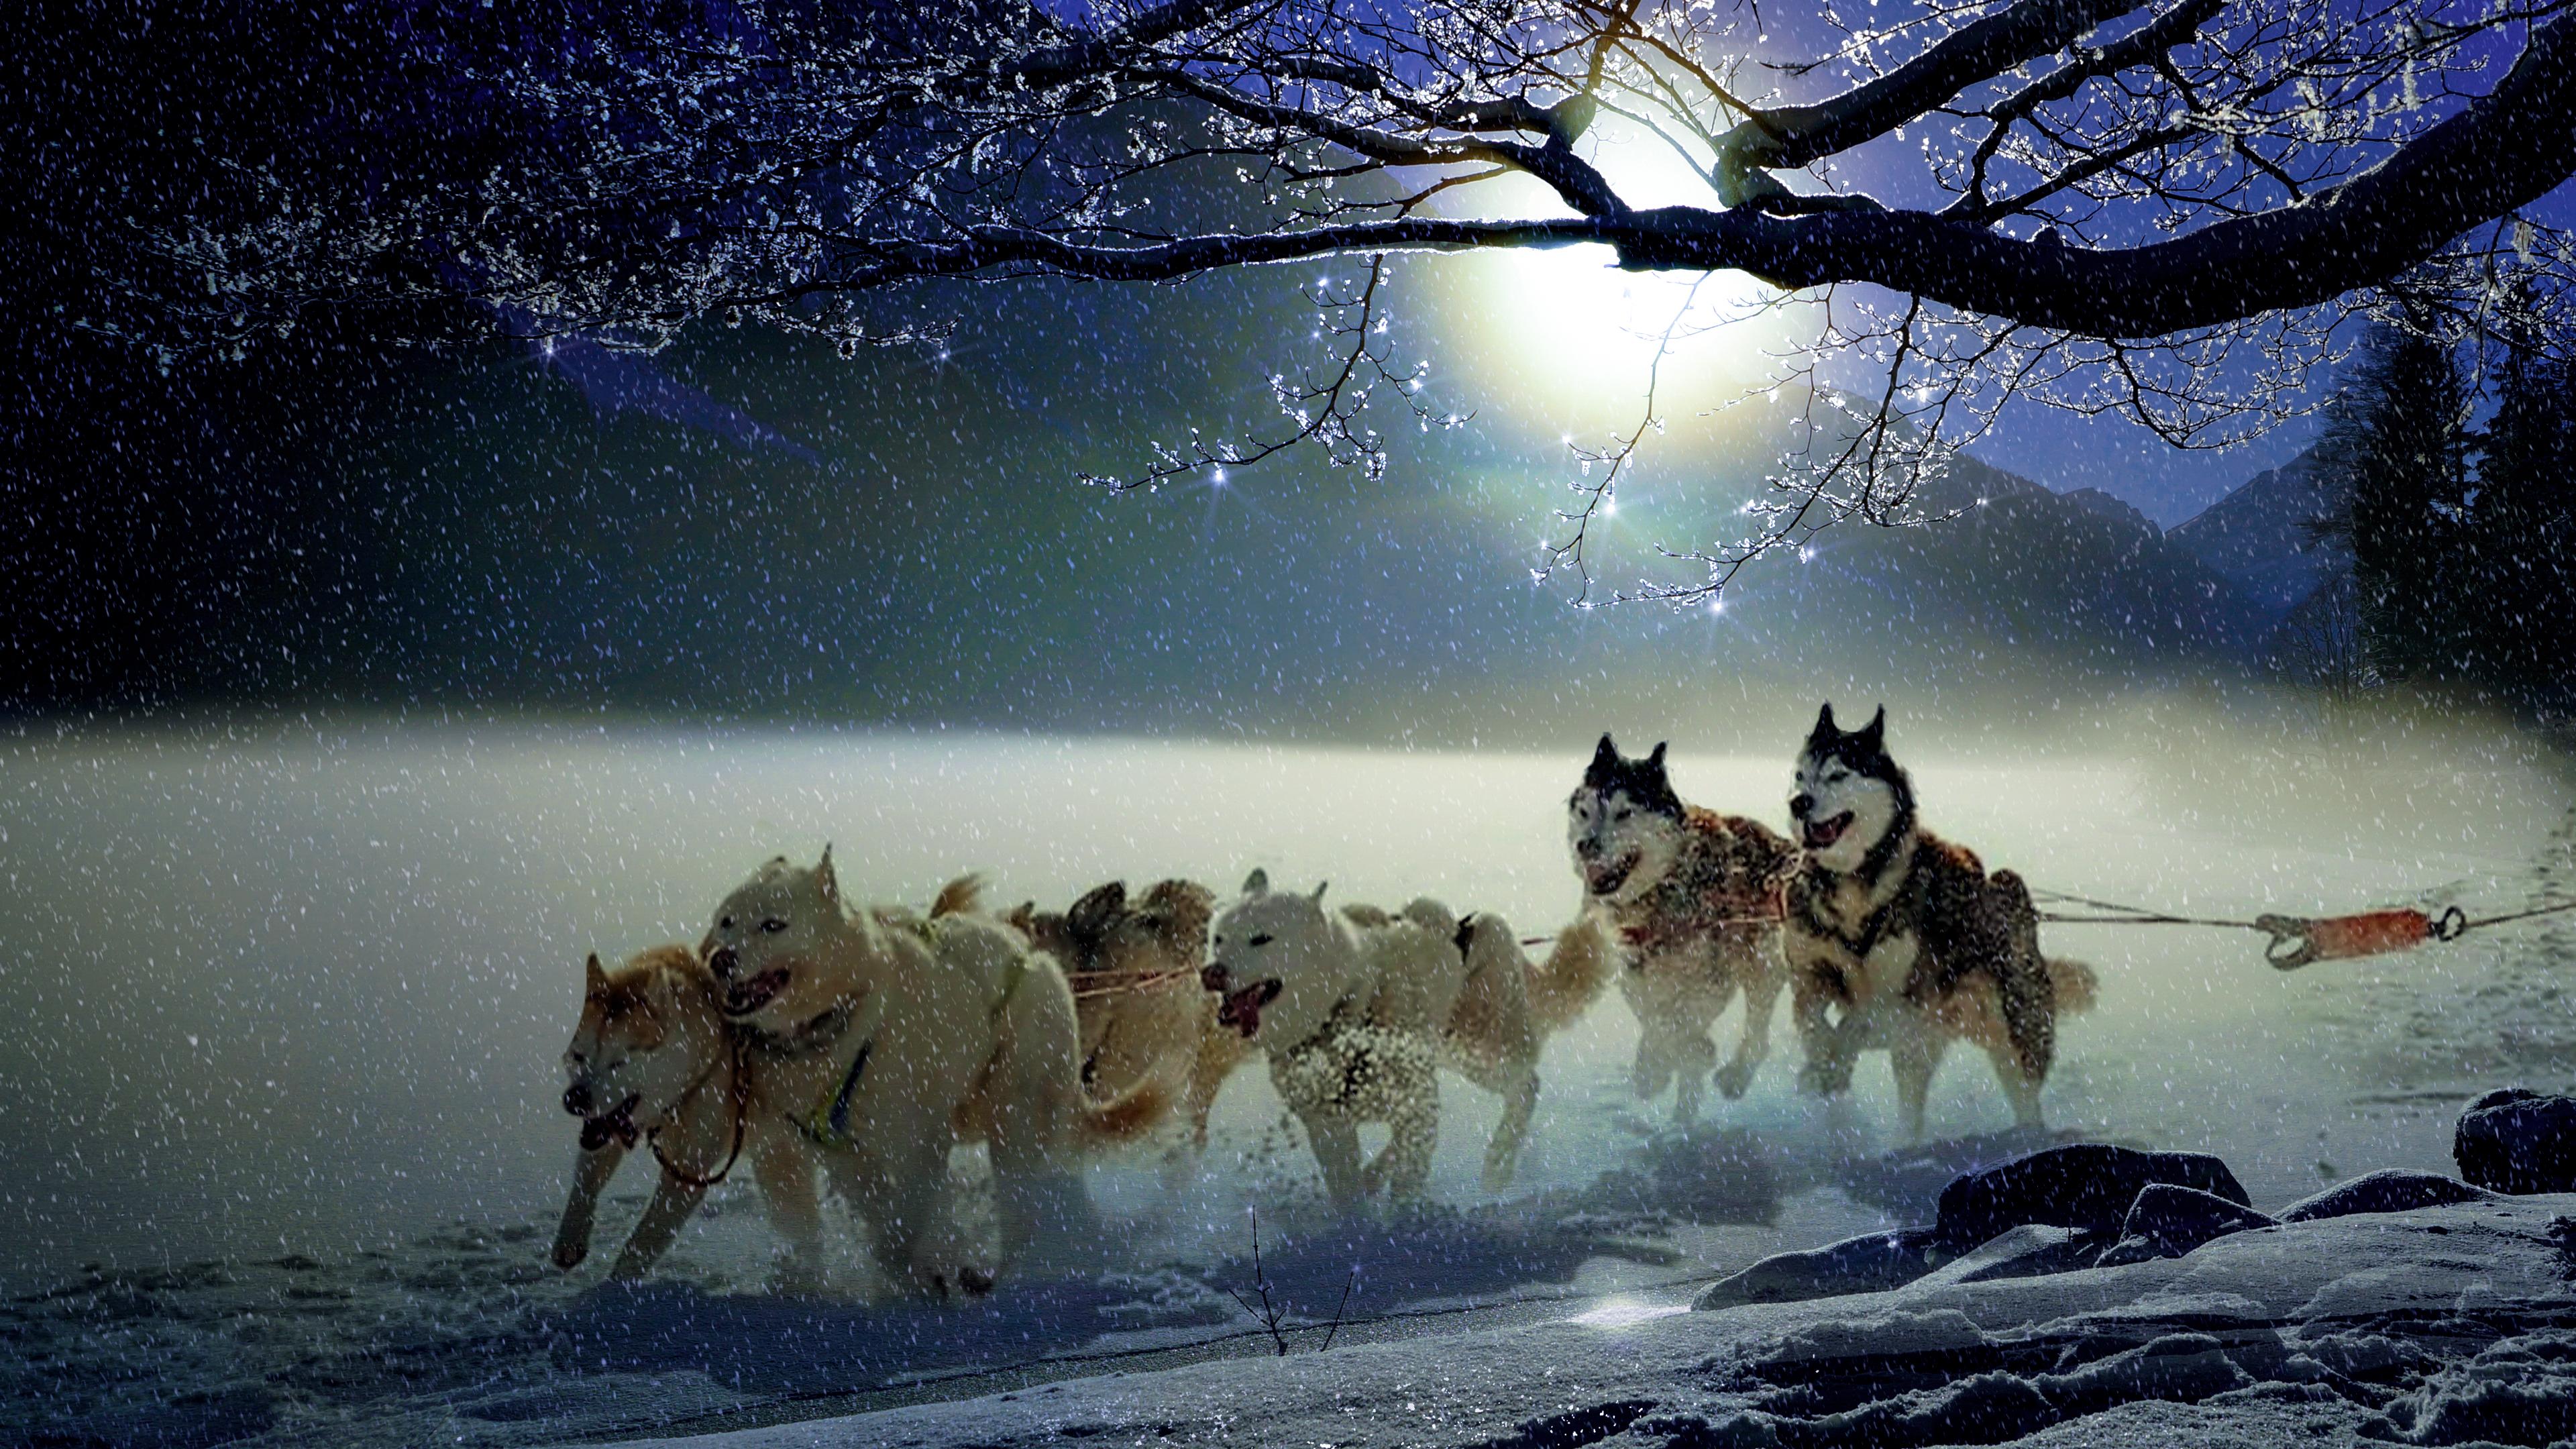 Dogs Wallpaper For Laptop 3840x2160 Wallpaper Teahub Io